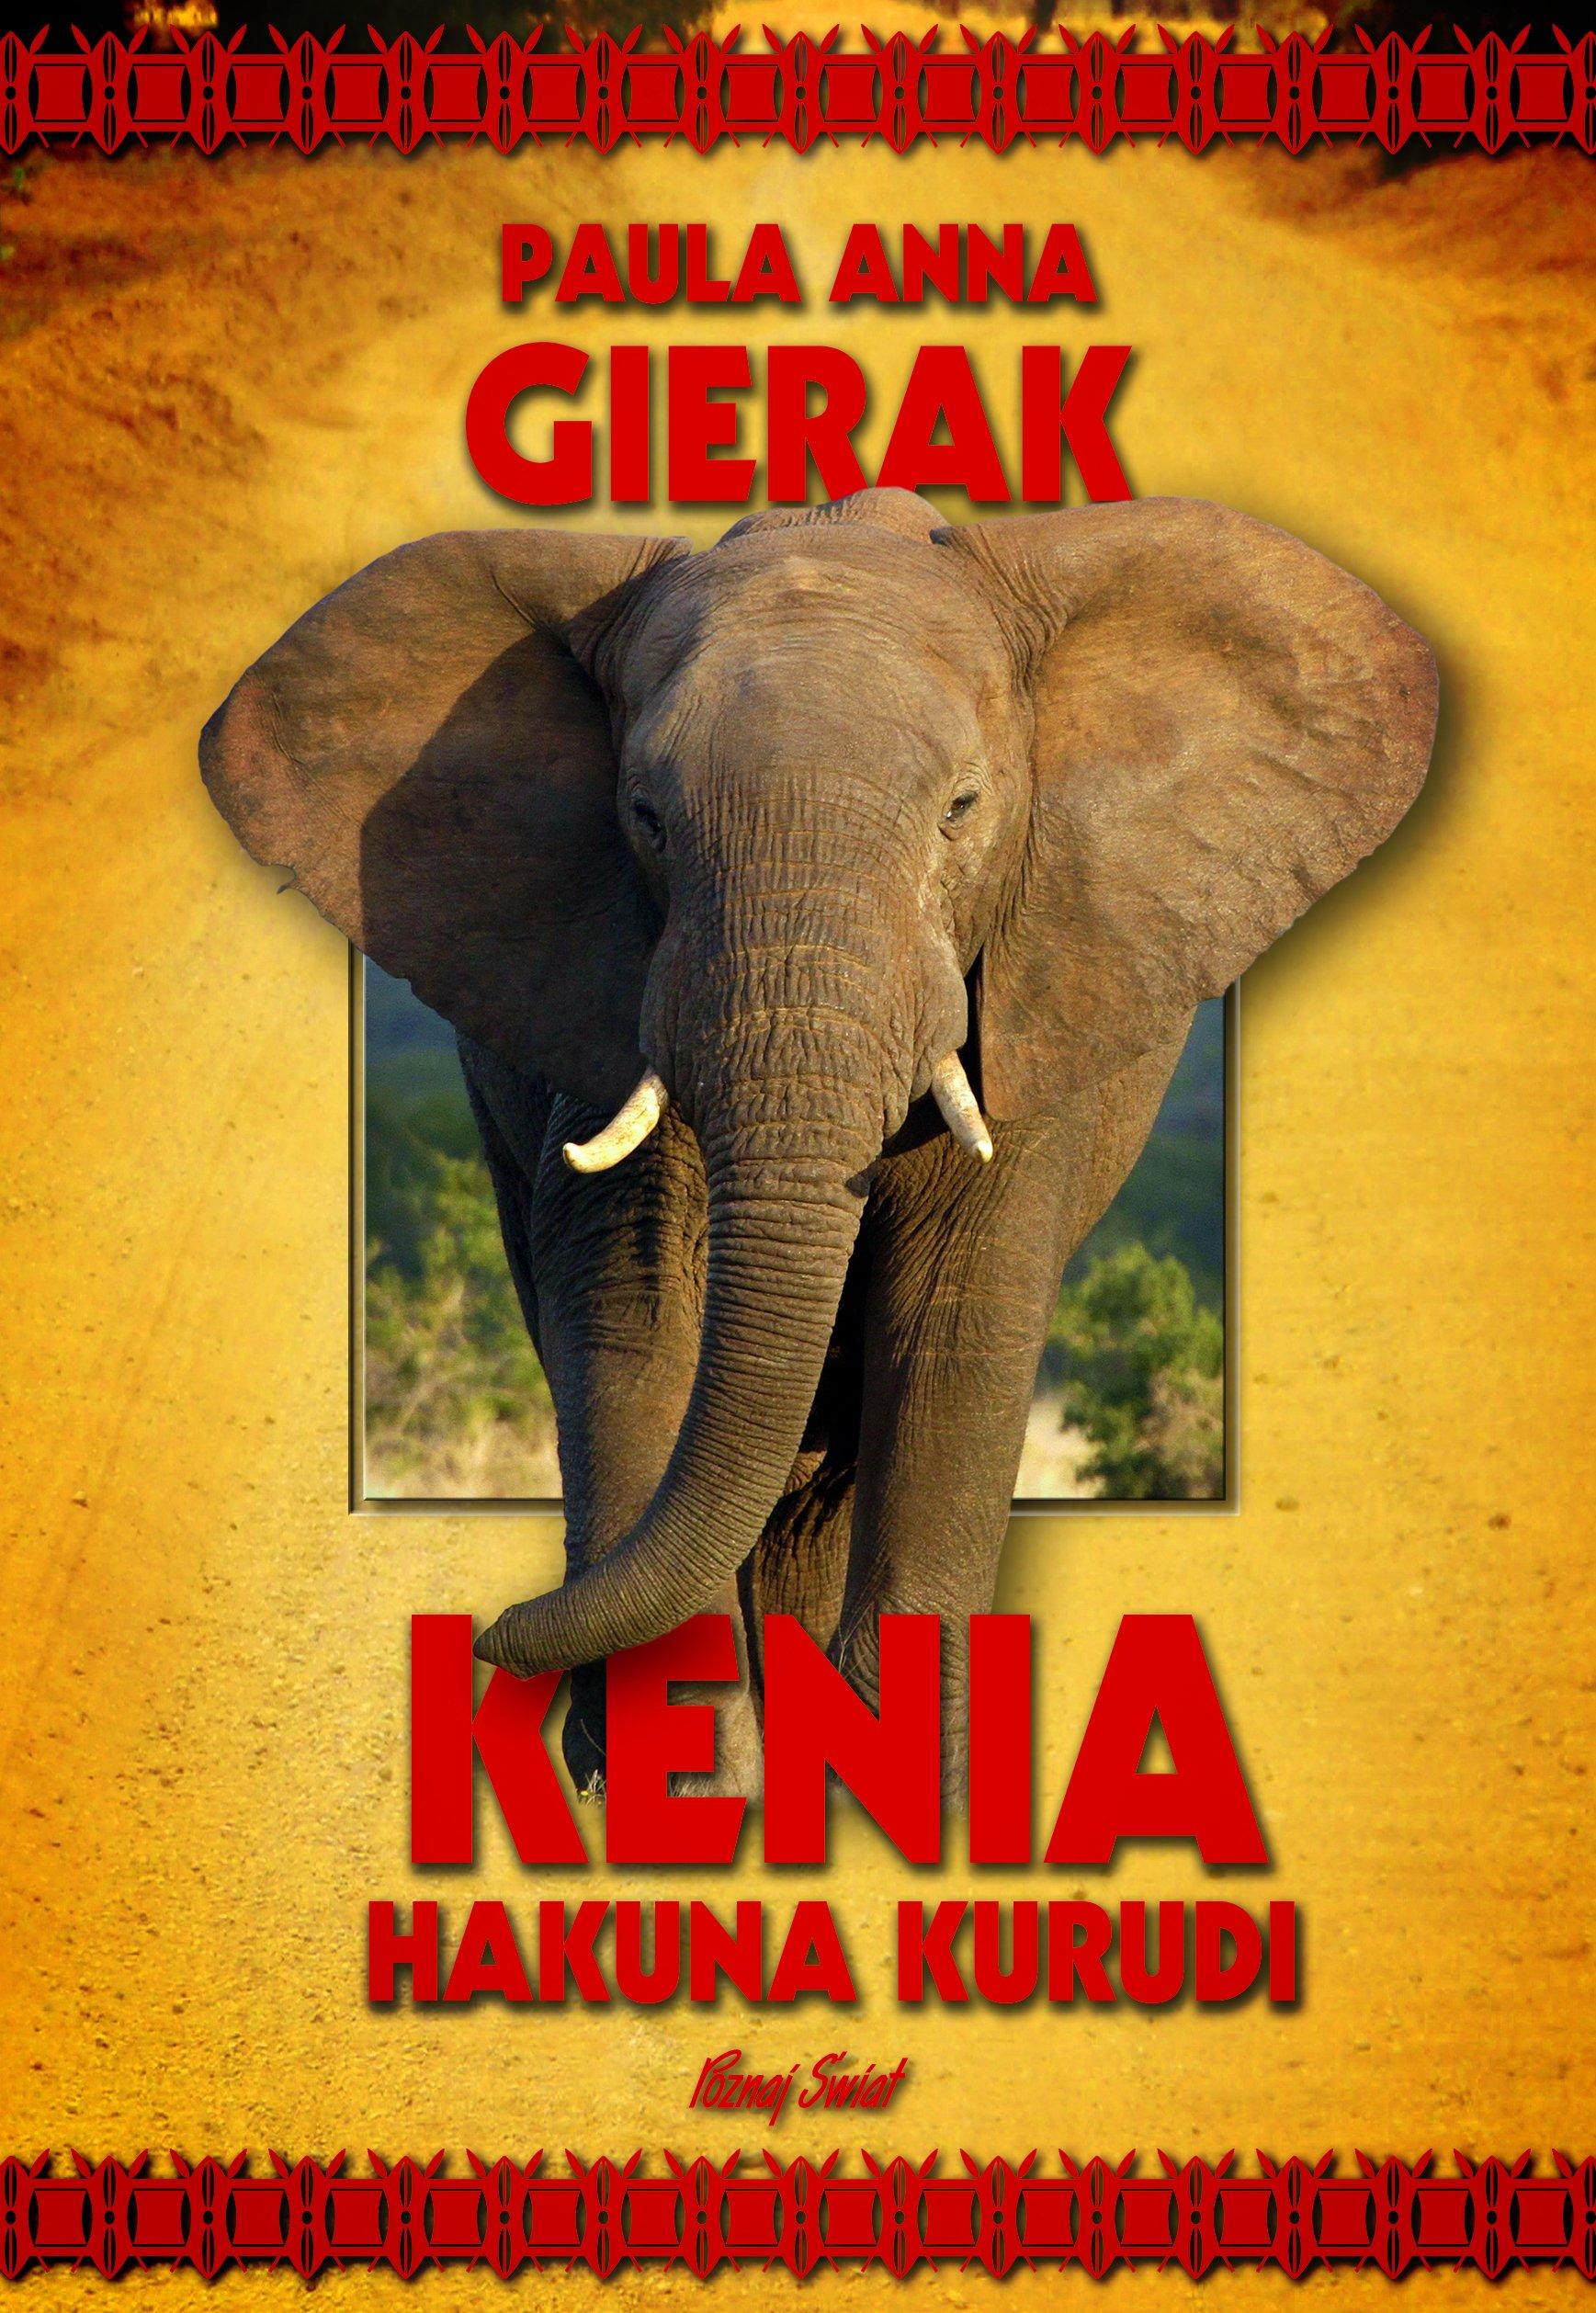 Kenia - Hakuna Kurudi książka Wydawnictwa Bernardinum